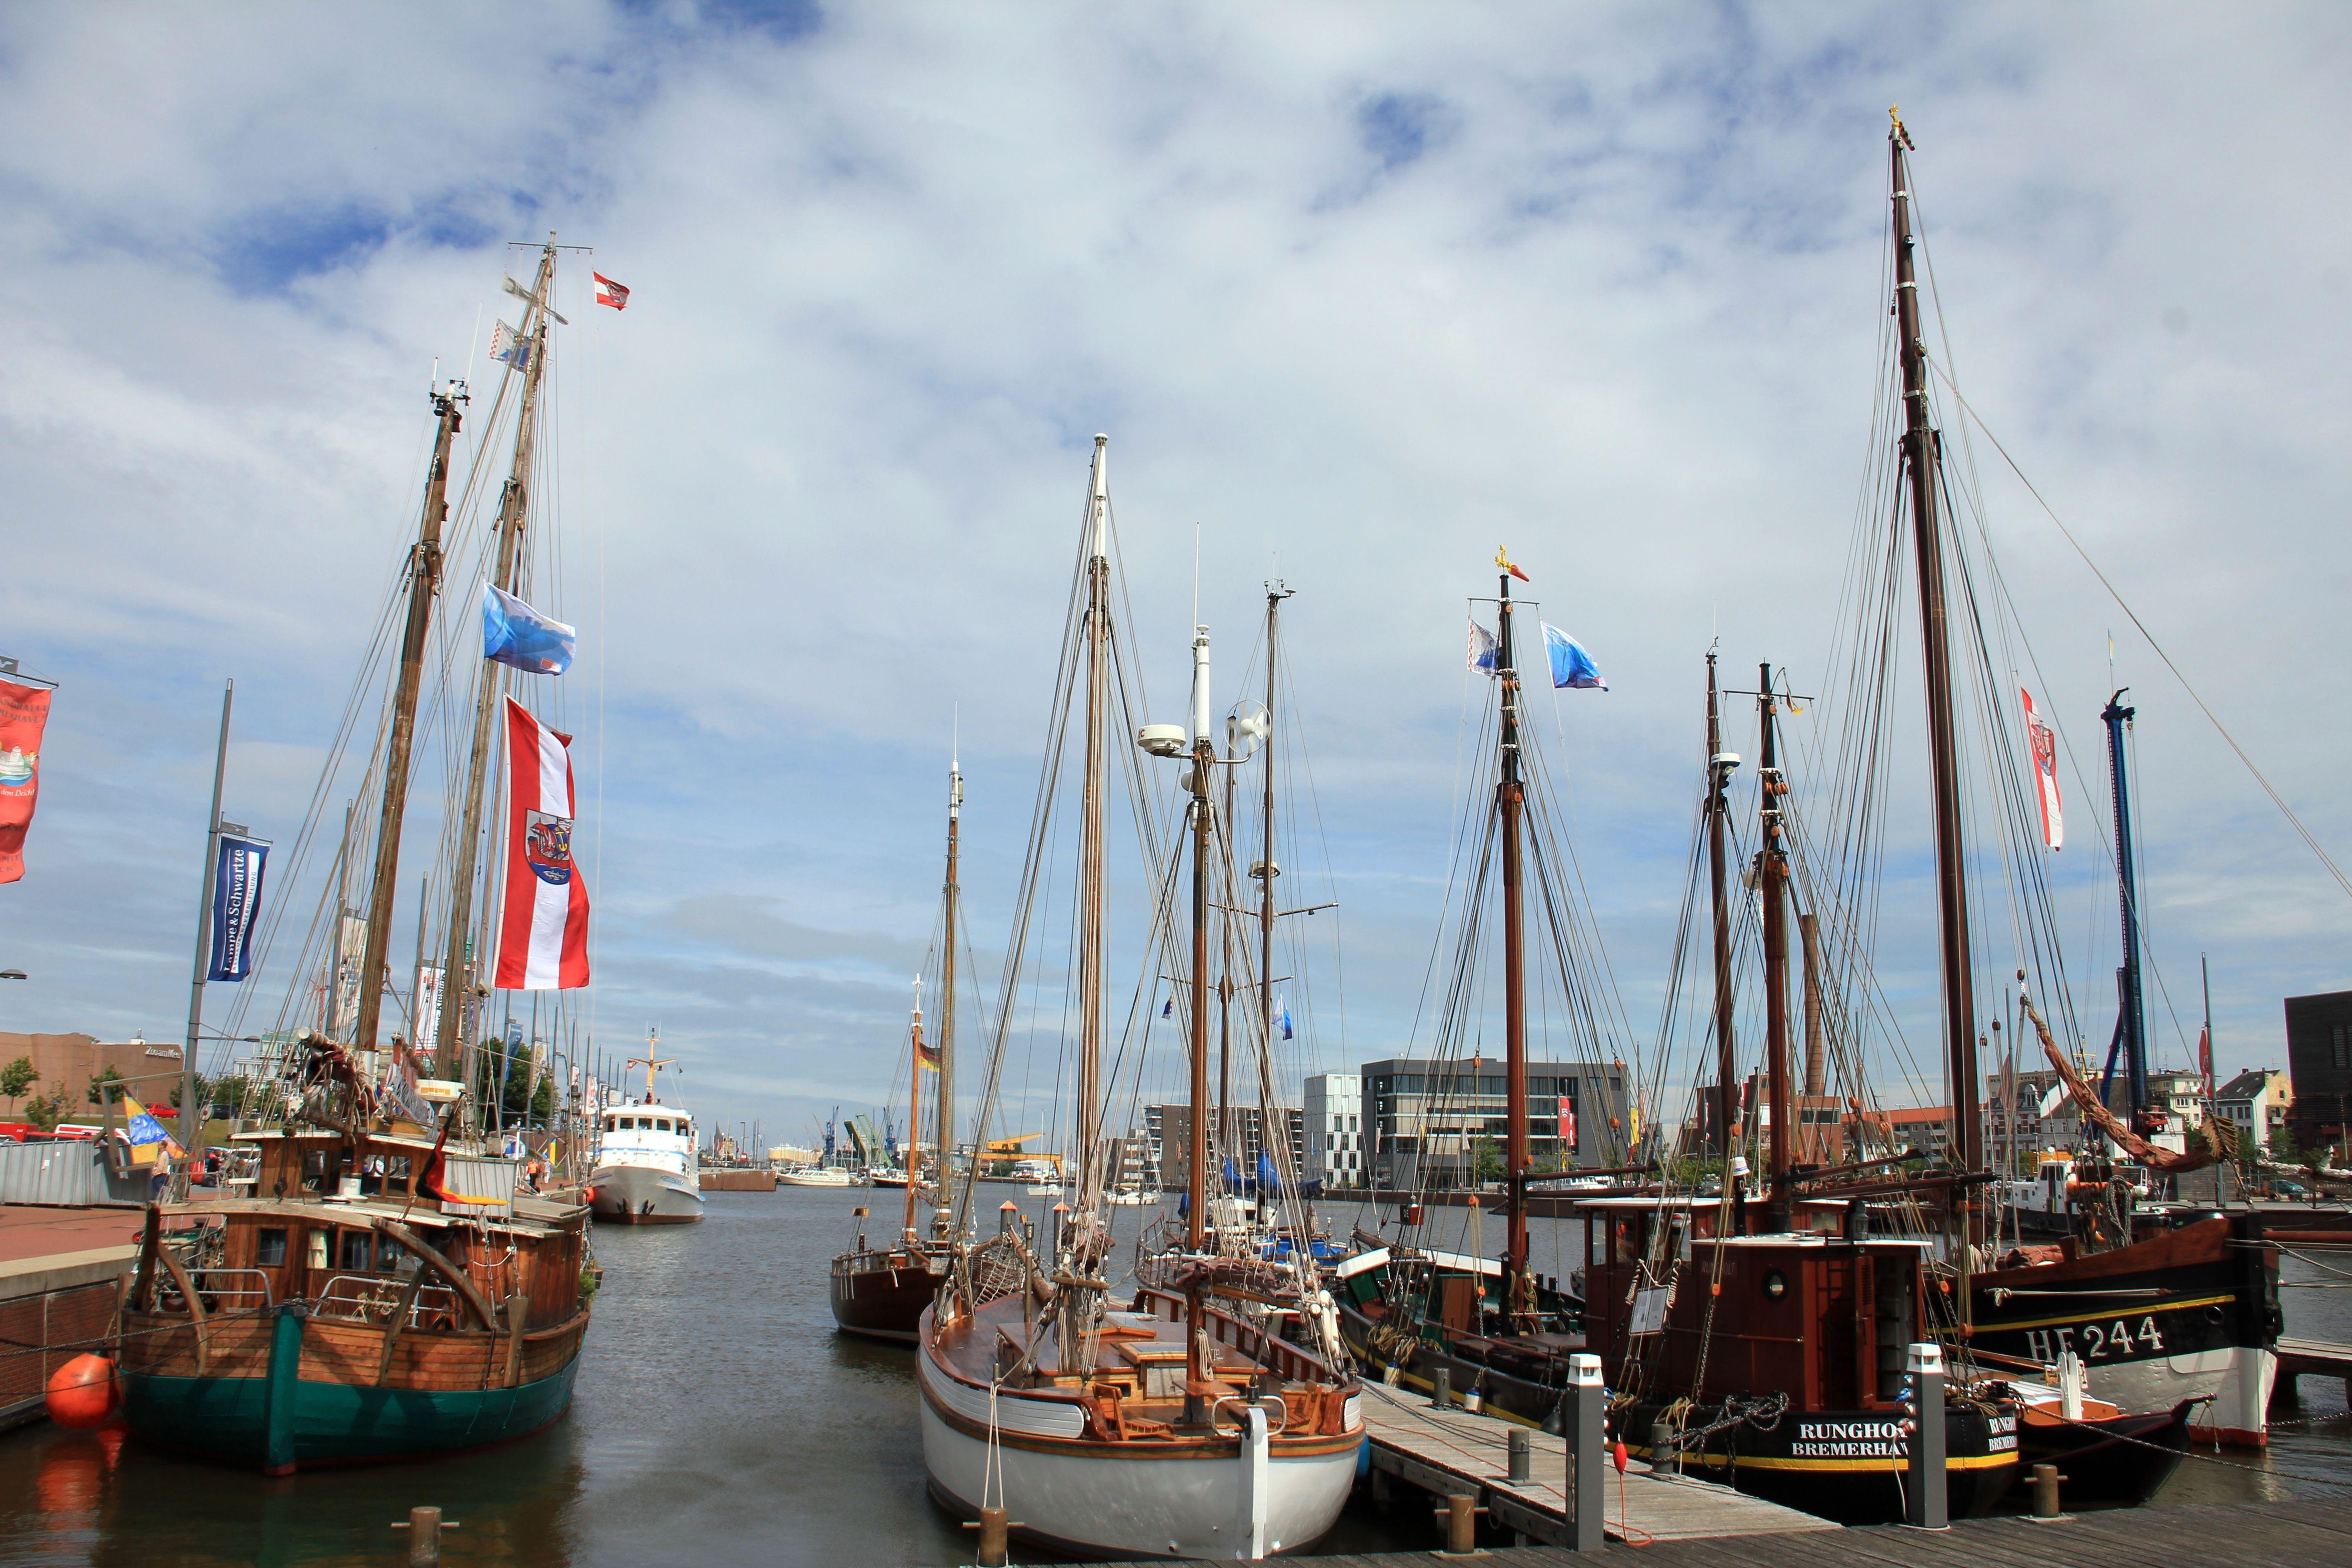 free images sea dock sky boat boot vehicle mast harbor